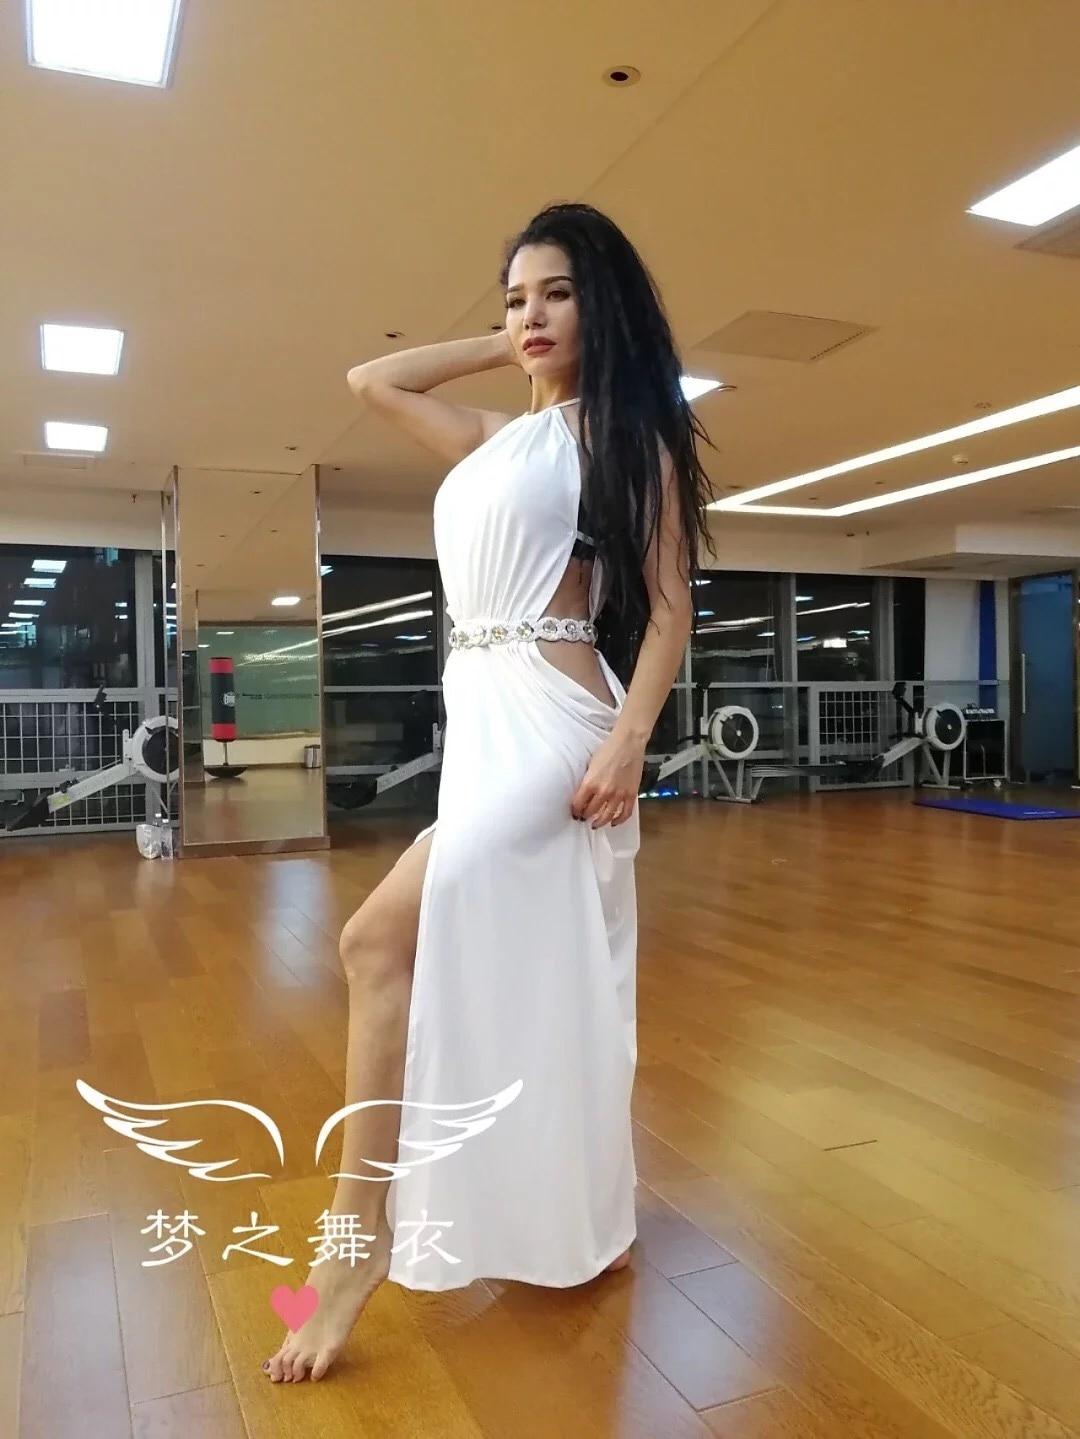 Oriental dancing costume hair swinging baladi Belly dance Indian Egyptian dance costume Bellydance bra belt skirt dress set 3027